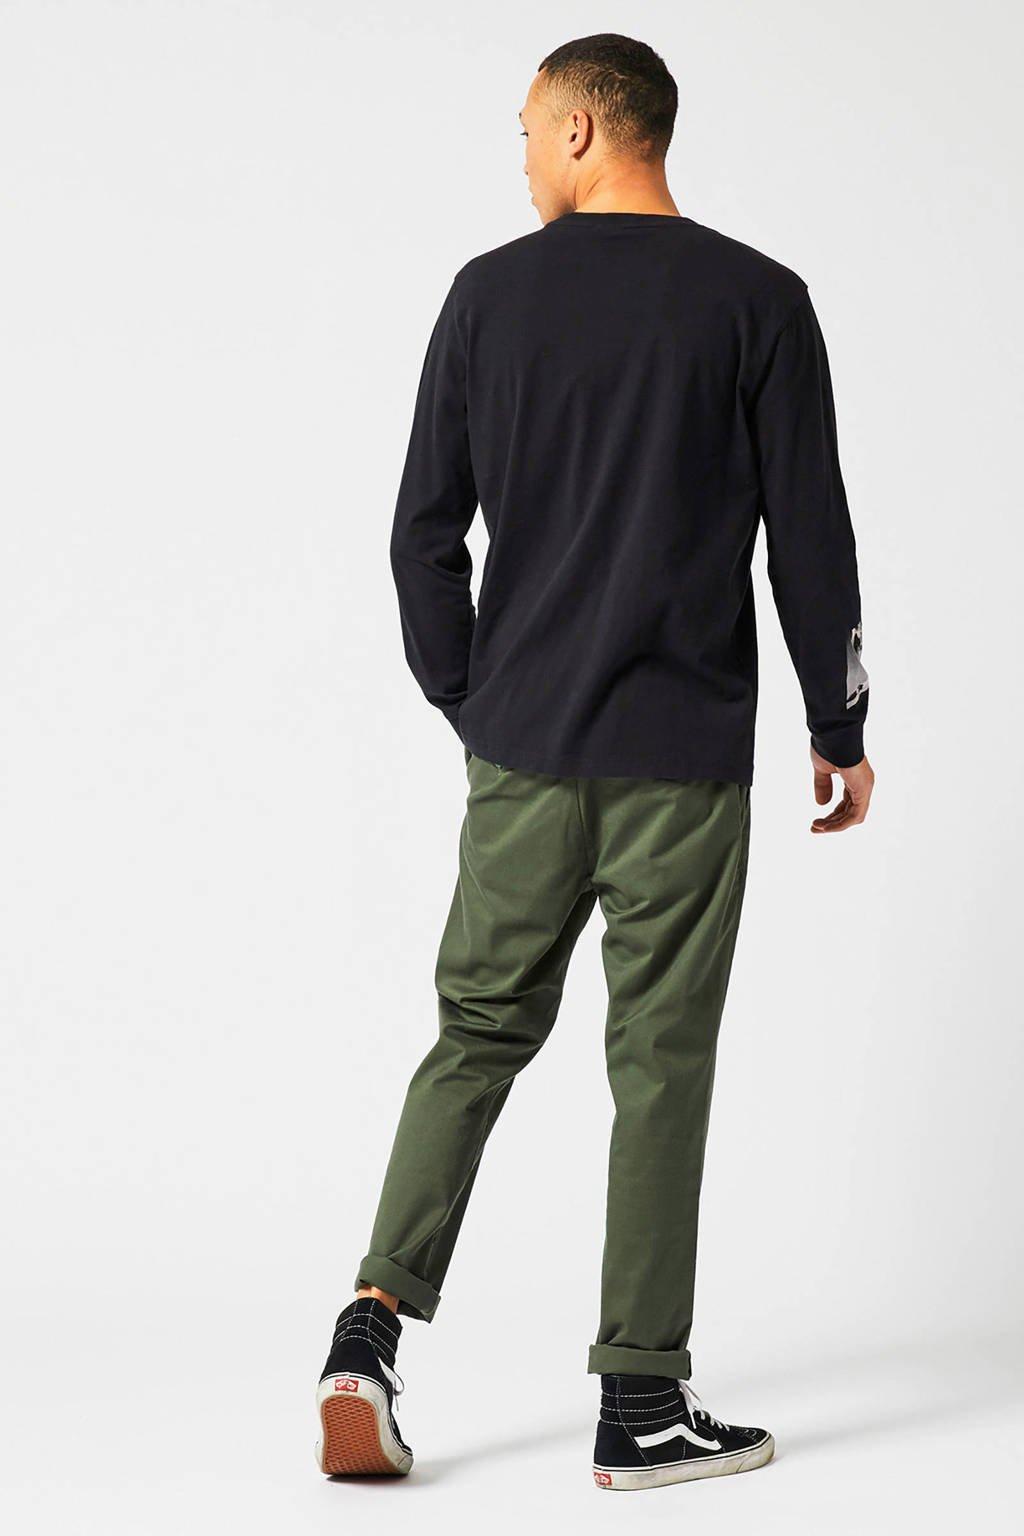 America Today sweater met printopdruk black, Black